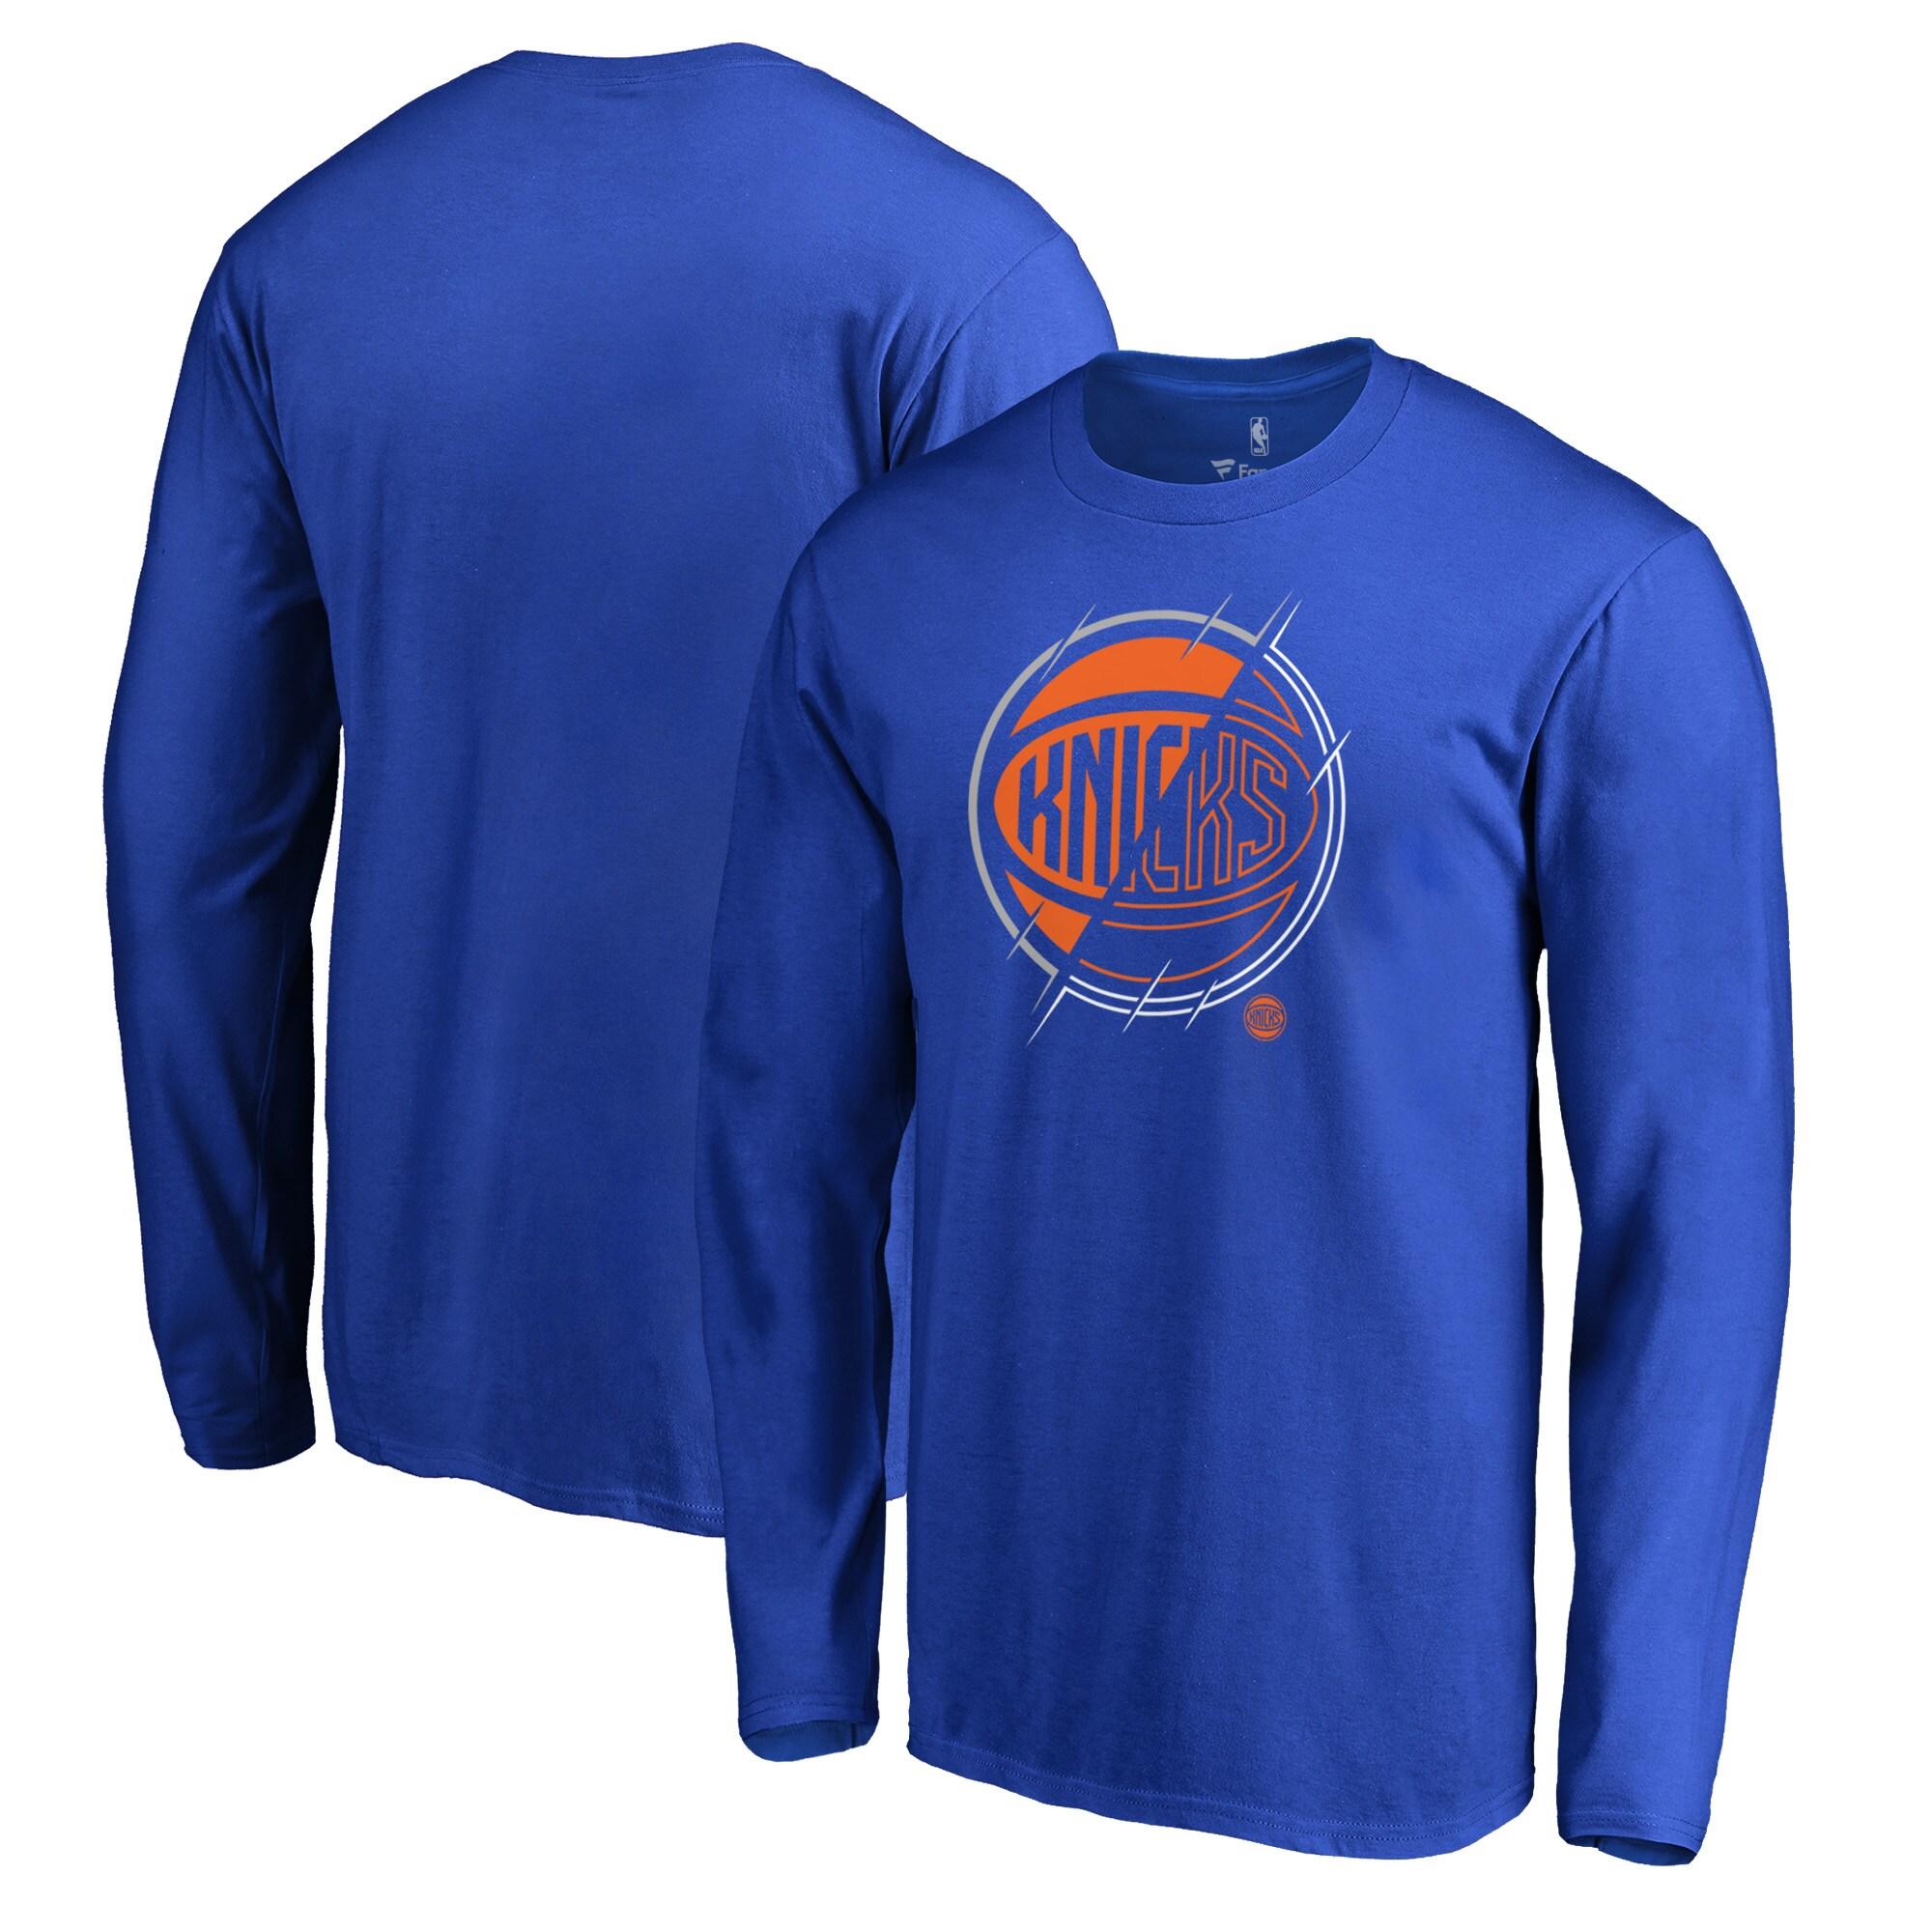 New York Knicks Fanatics Branded X-Ray Long Sleeve T-Shirt - Royal